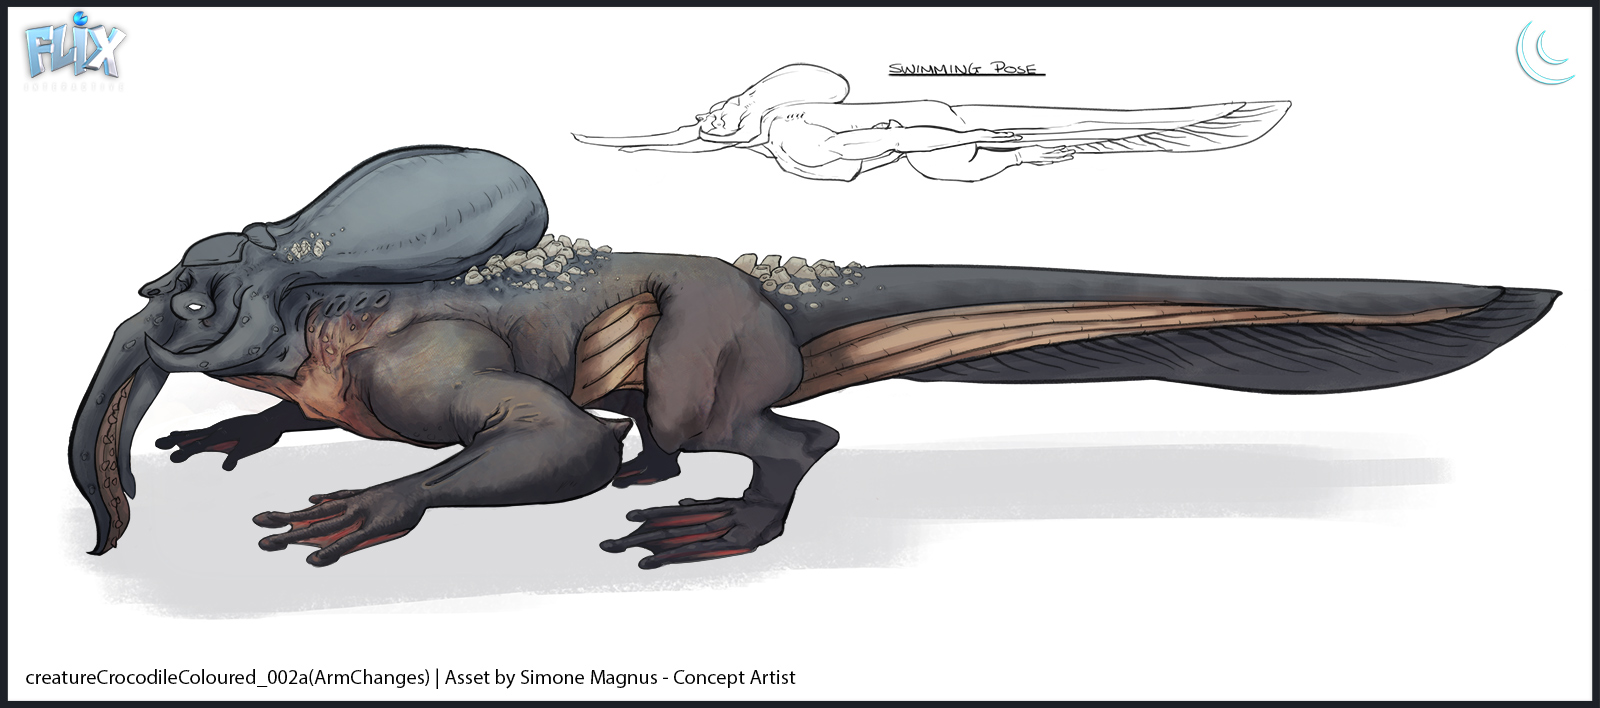 creature_Crocodile_Coloured_002a